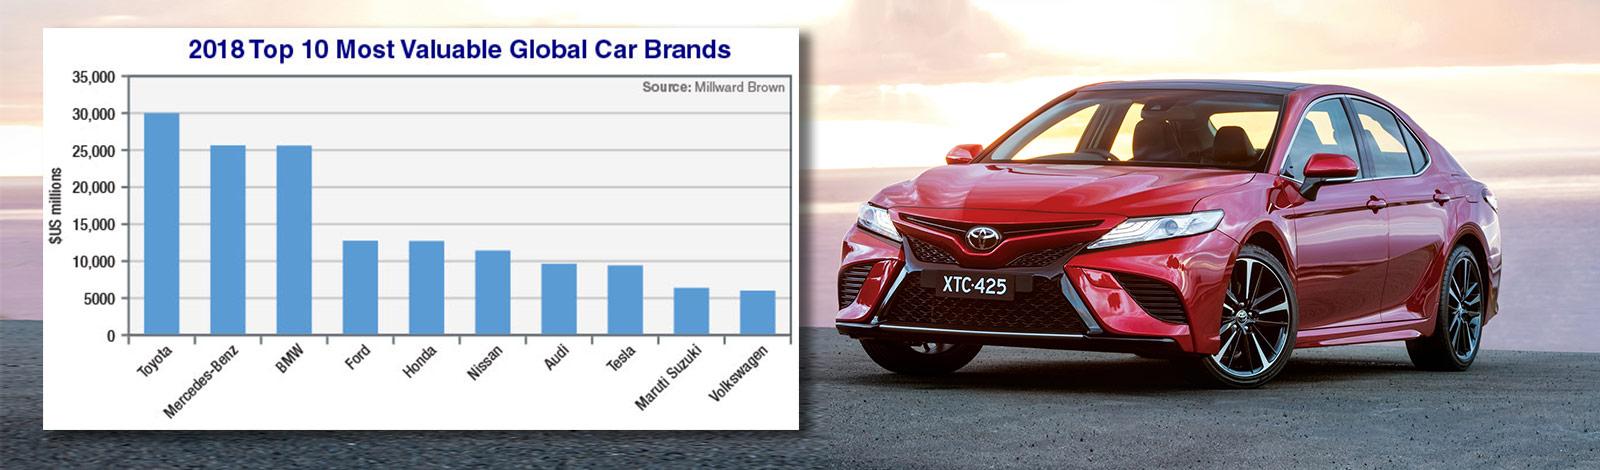 Toyota tops again in BrandZ list